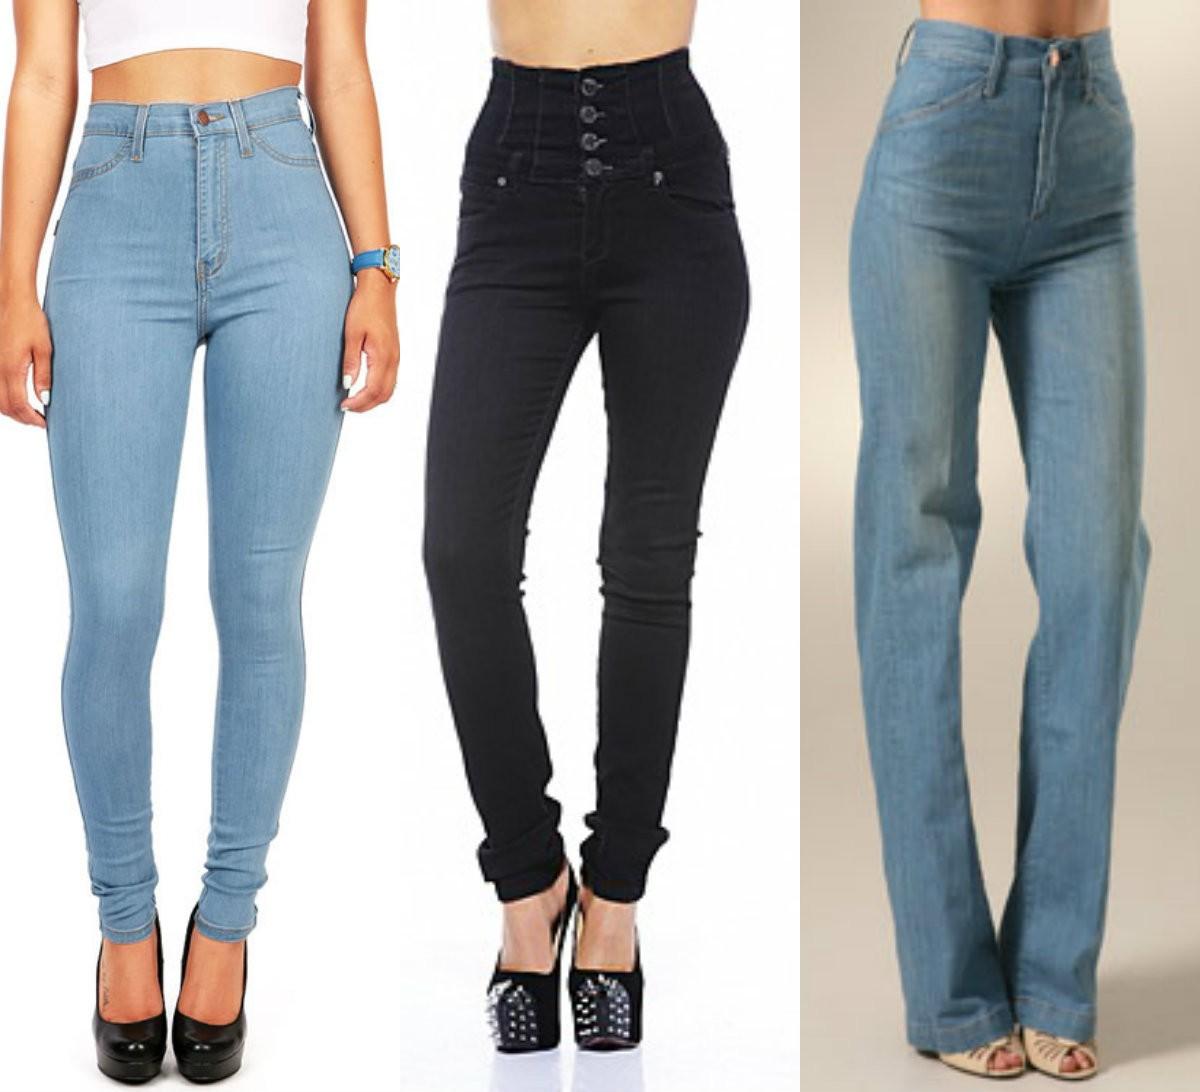 High-wasted rise джинсы с высокой посадкой